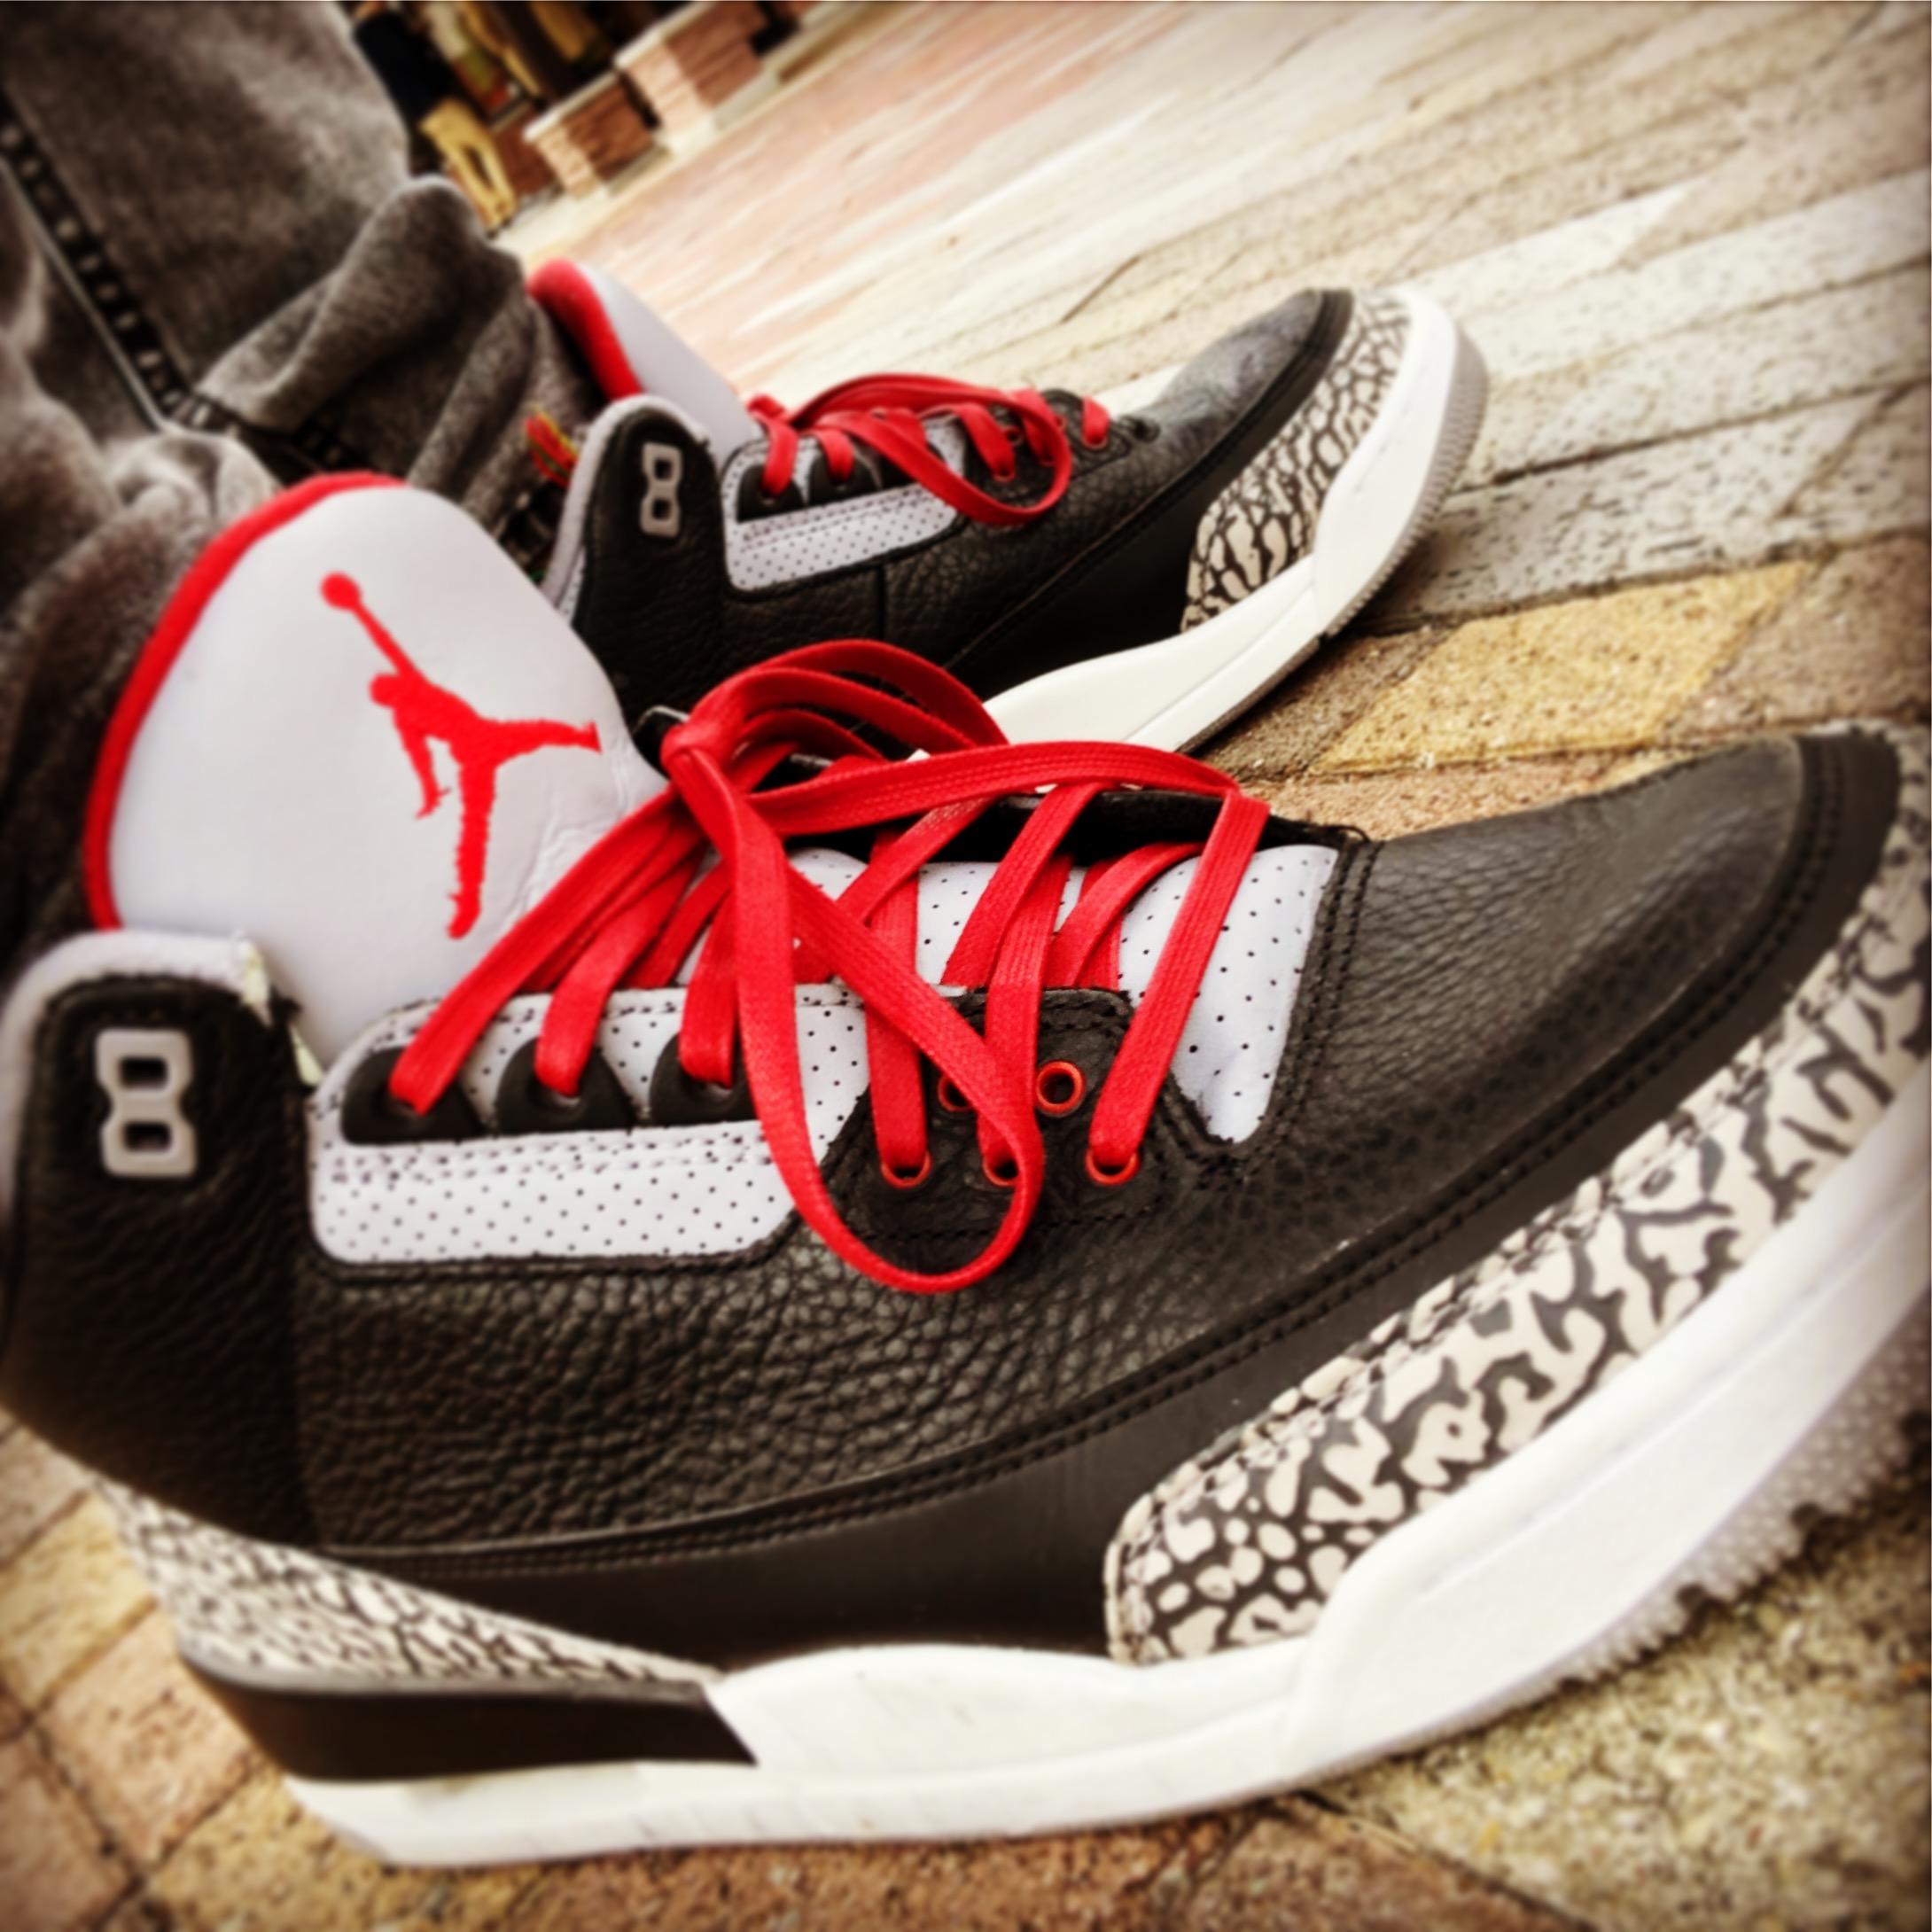 Air Jordan 3 Black cementにkix sixのシューレース